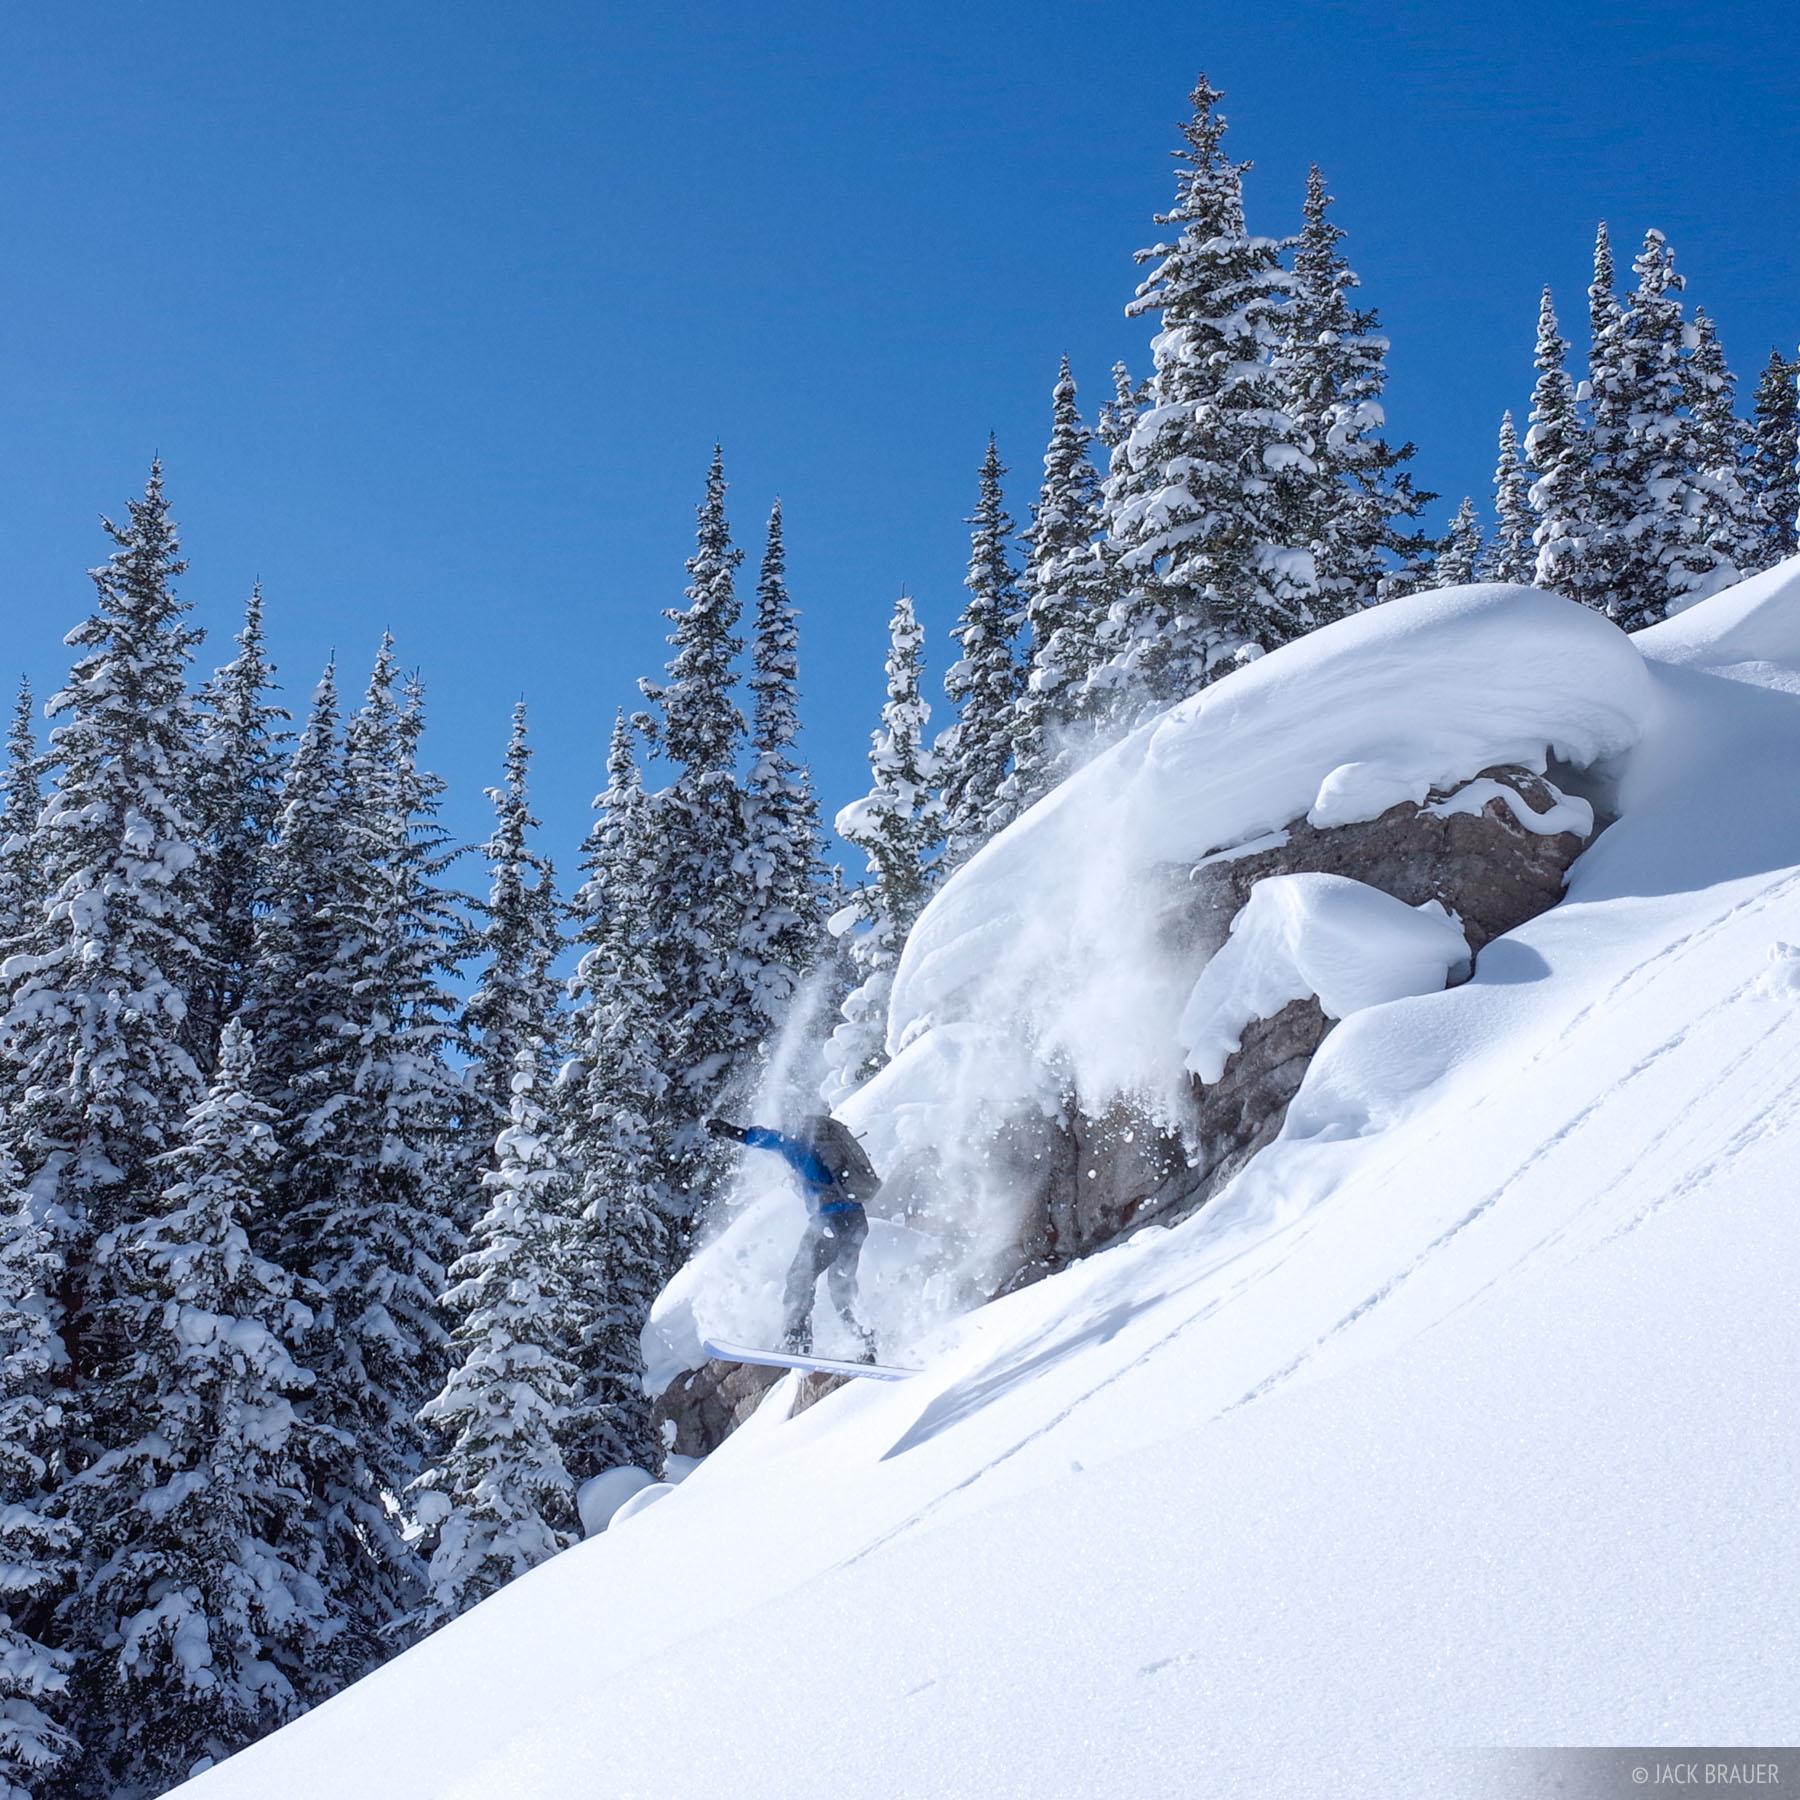 Colorado, Fowler Hilliard, Gore Range, January, snowboarding, Fowler/Hilliard, winter, active, 2014